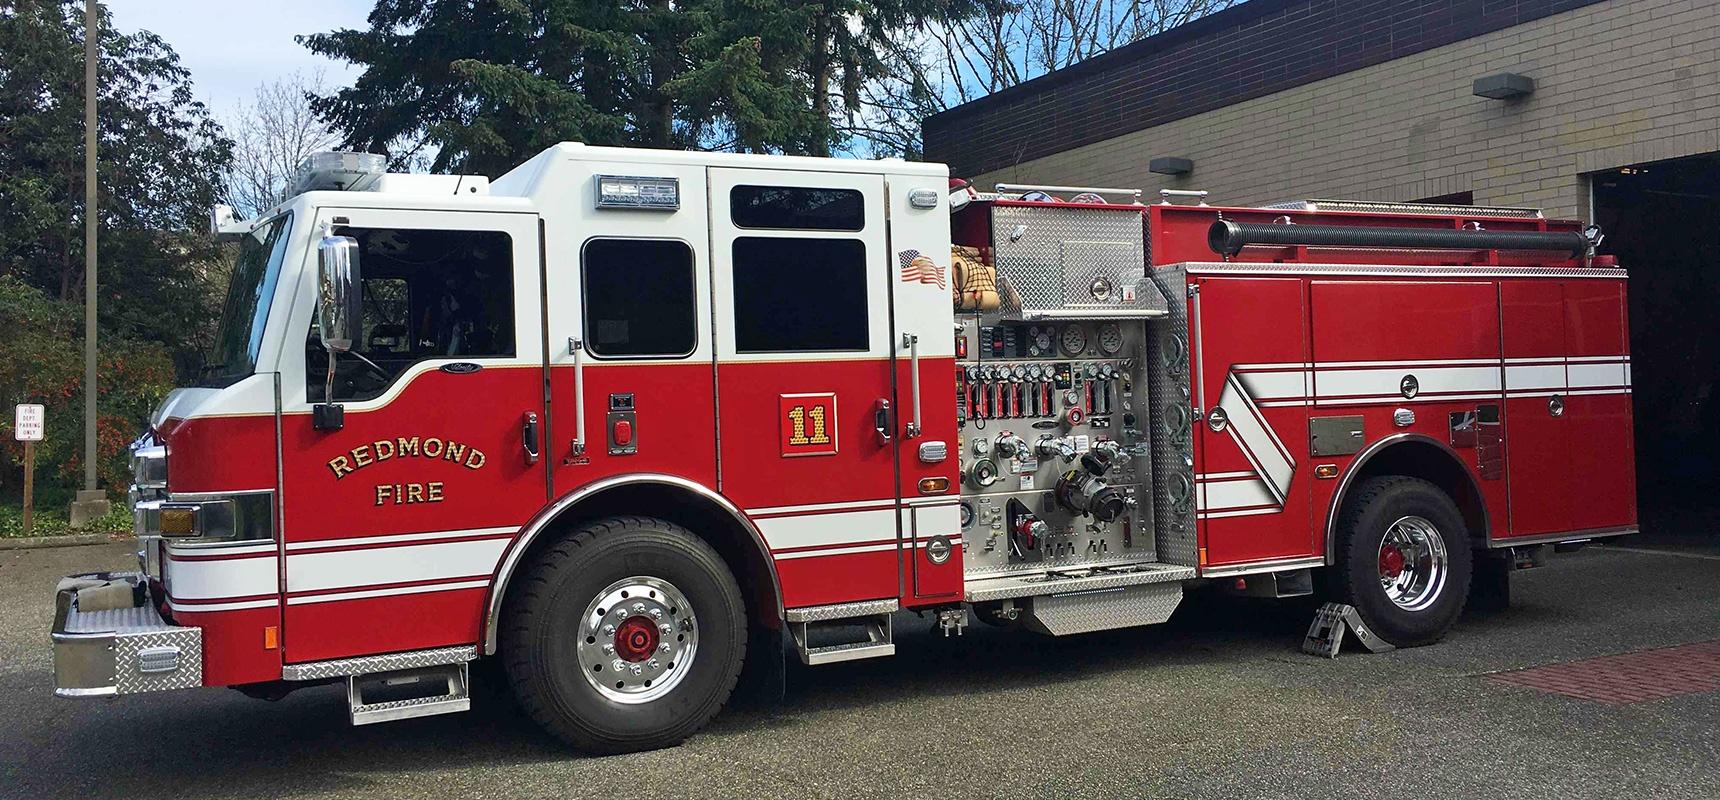 Redmond,-Wash.-Fire-Department-Takes-Delivery-of-Three-Pierce-Apparatus-Now-a-100-Percent-Pierce-Fleet_Header.jpg